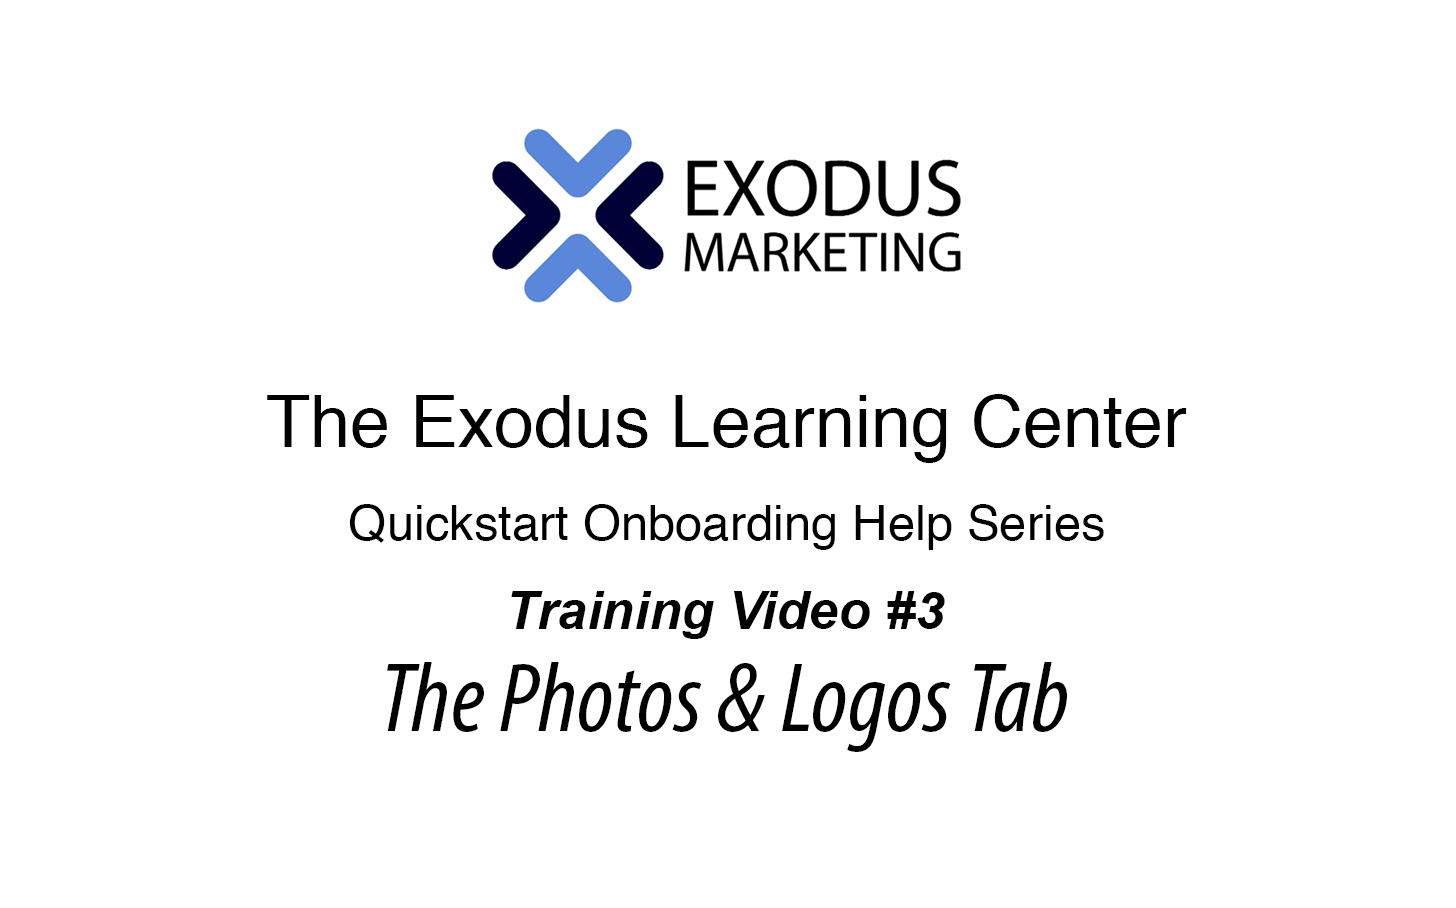 #3 UnderstandingThe Photos & Logos Tab